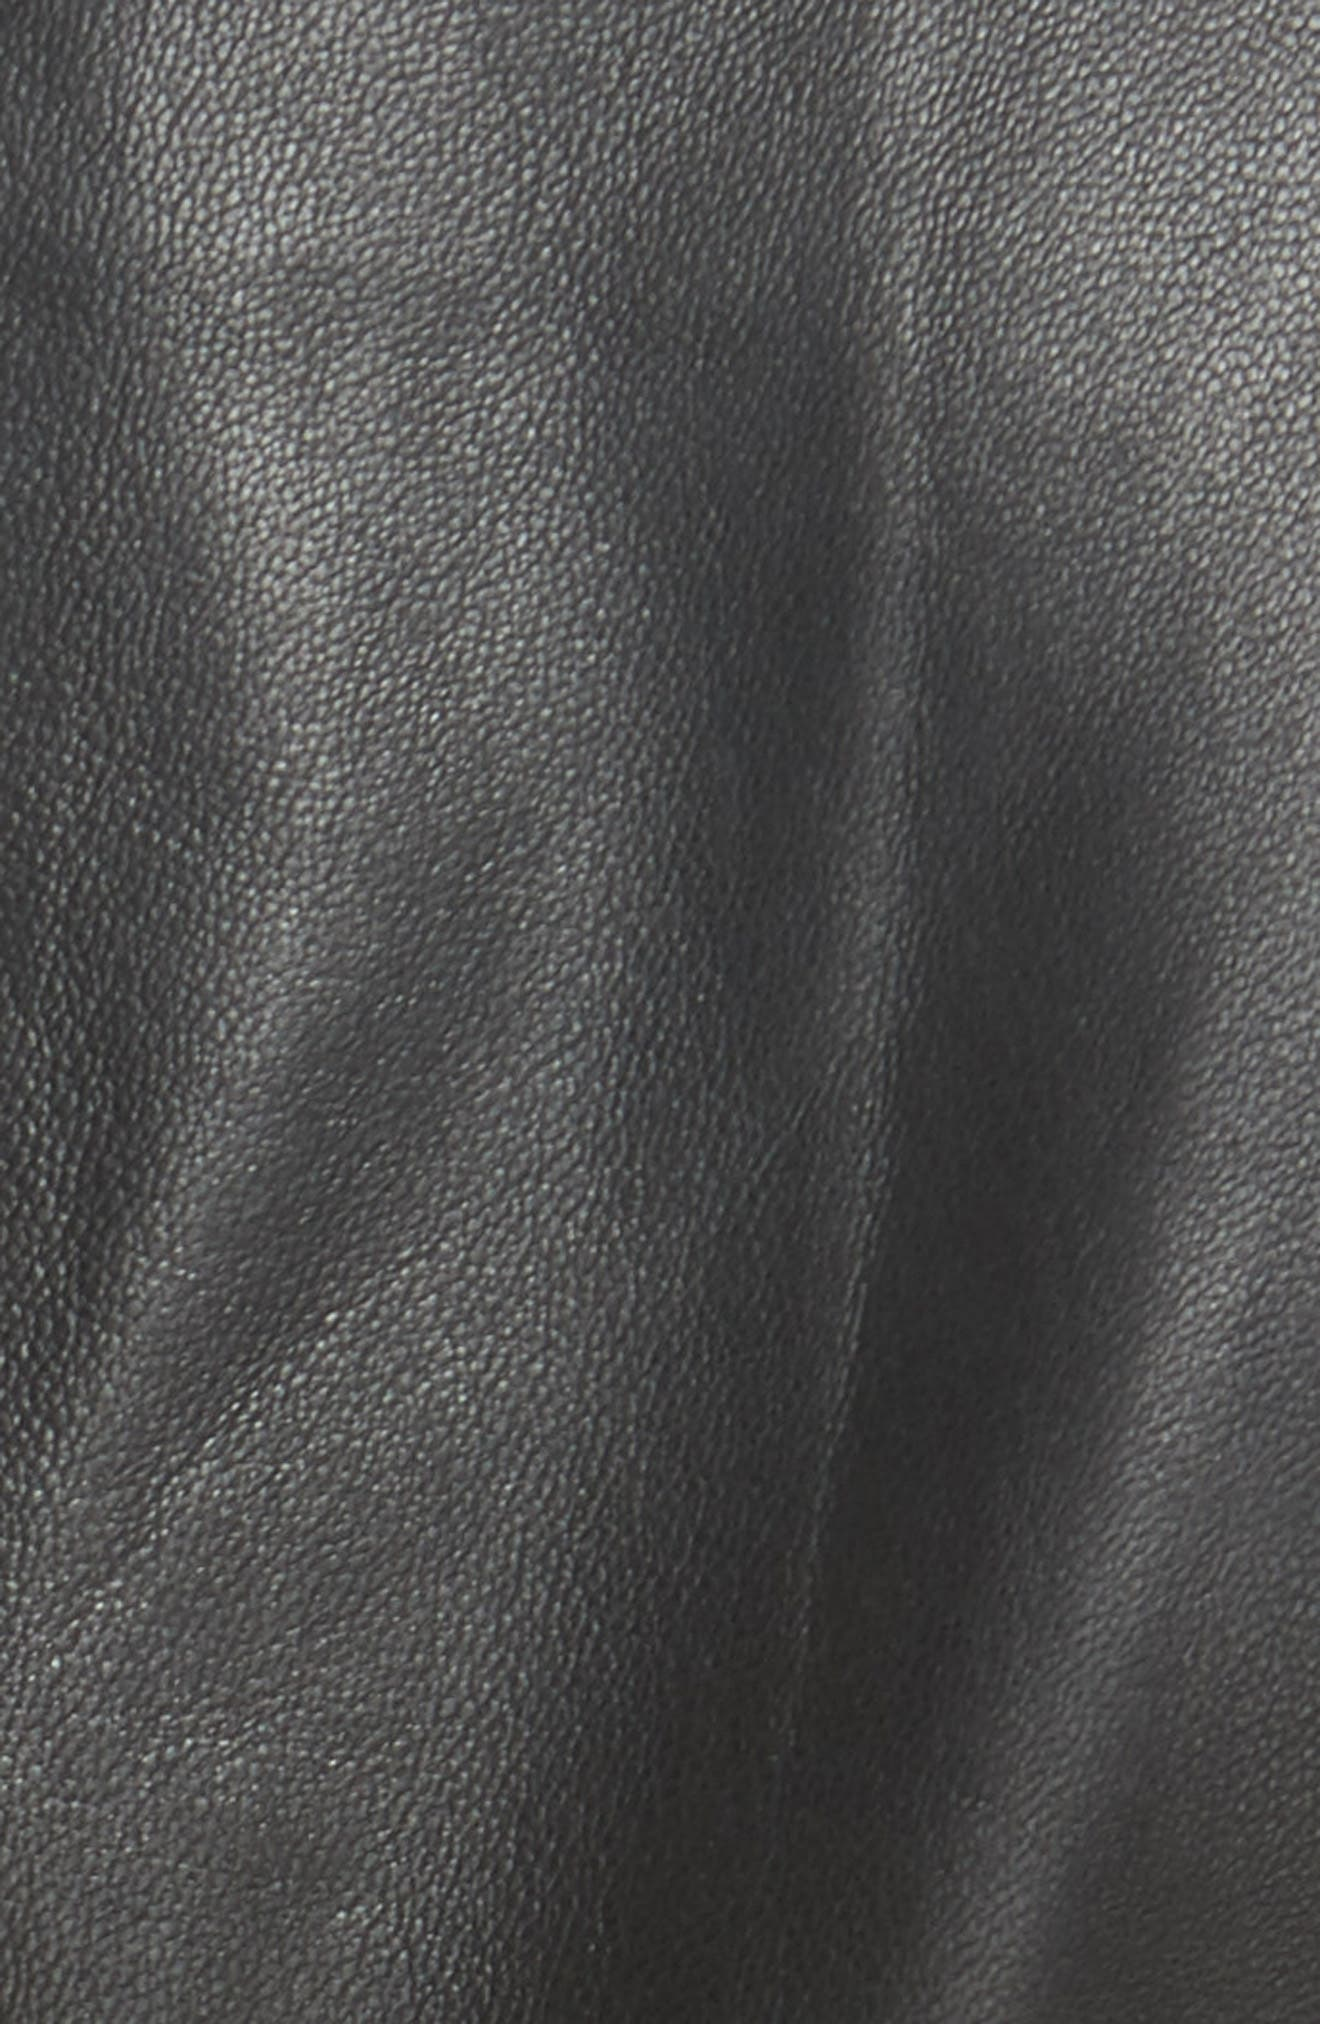 Lightweight Leather Bolero,                             Alternate thumbnail 6, color,                             001